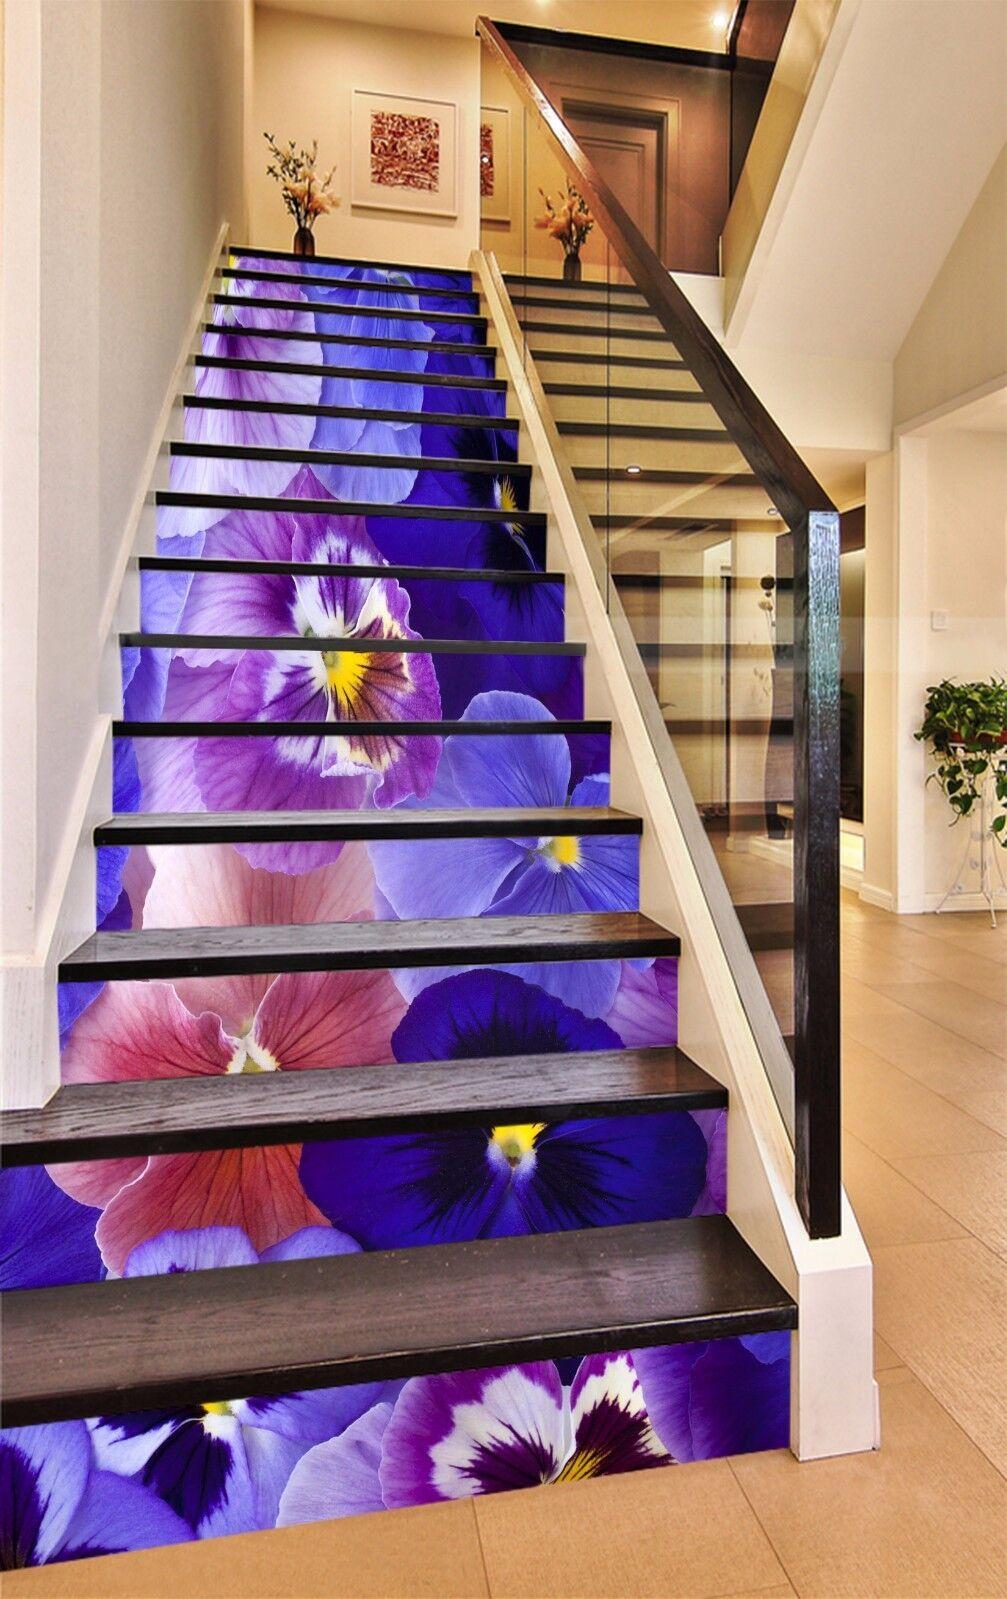 3D Phalaenopsis 20 Stairs Risers Decoration Photo Mural Vinyl Decal WandPapier US